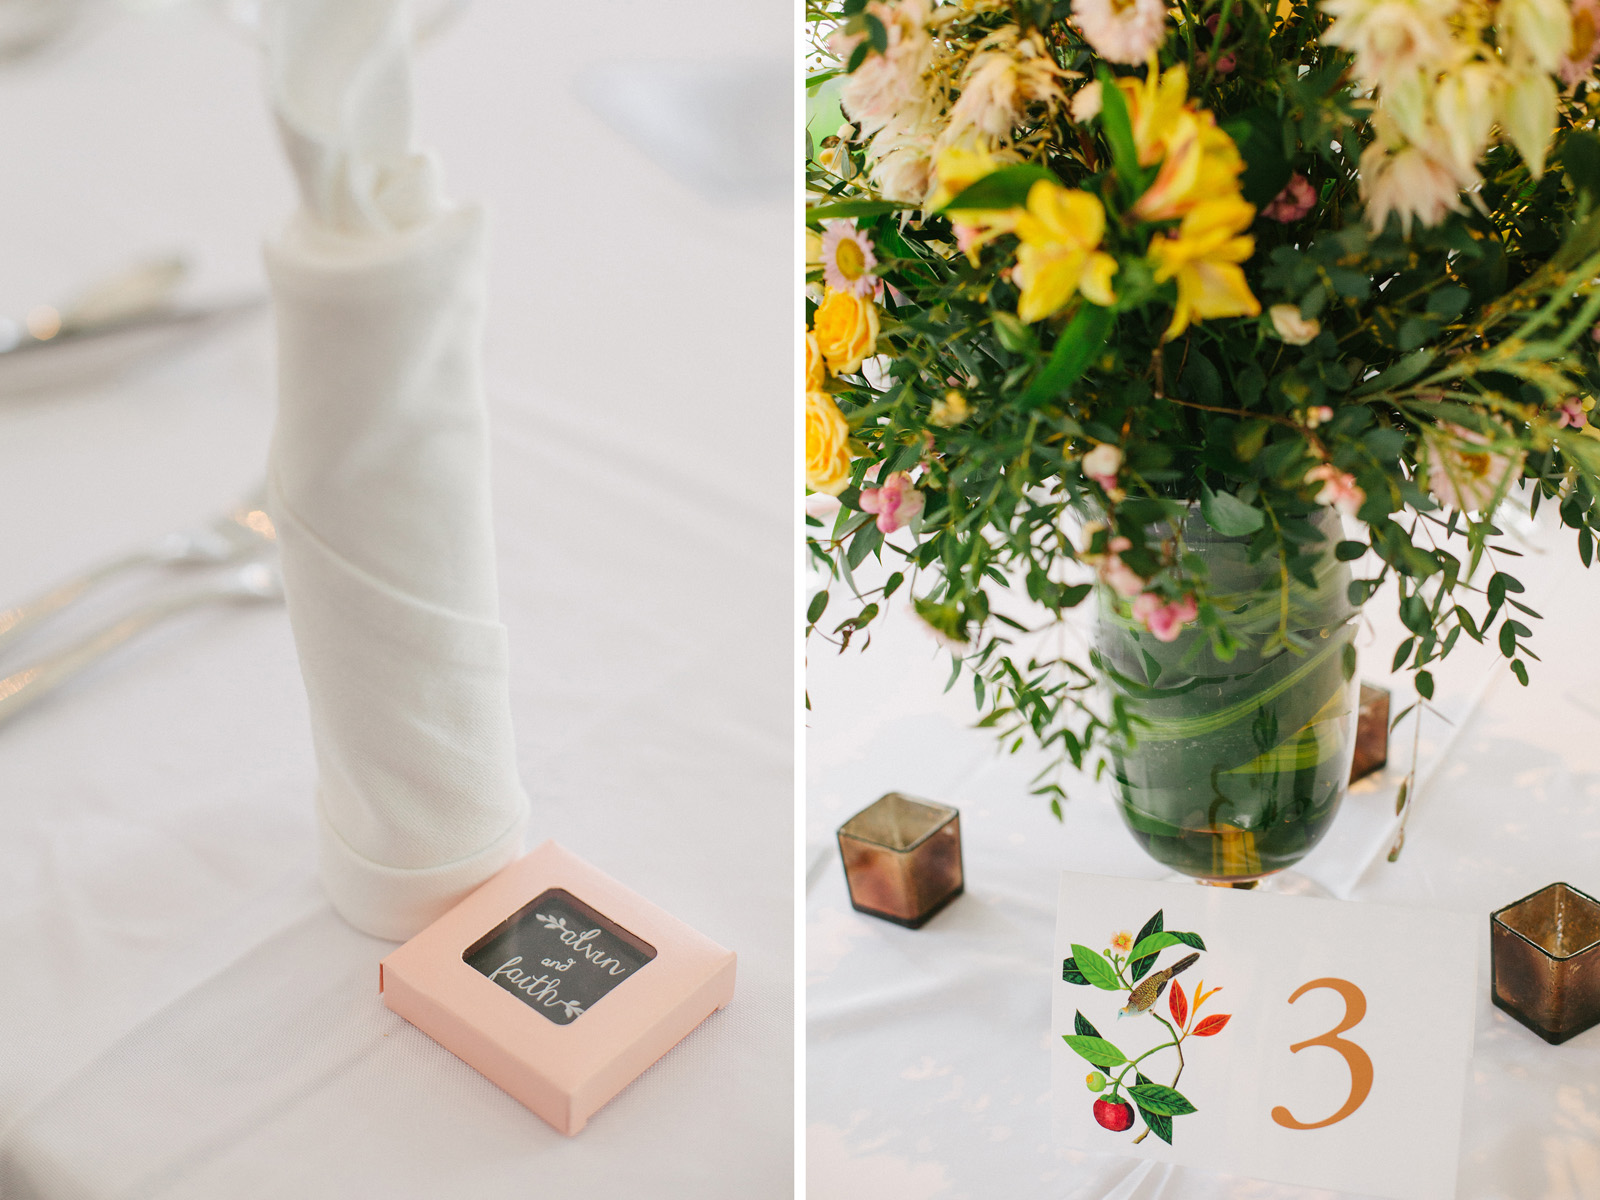 singapore-wedding-travel-photographer-faith-alvin-wedding-wmt-24.jpg